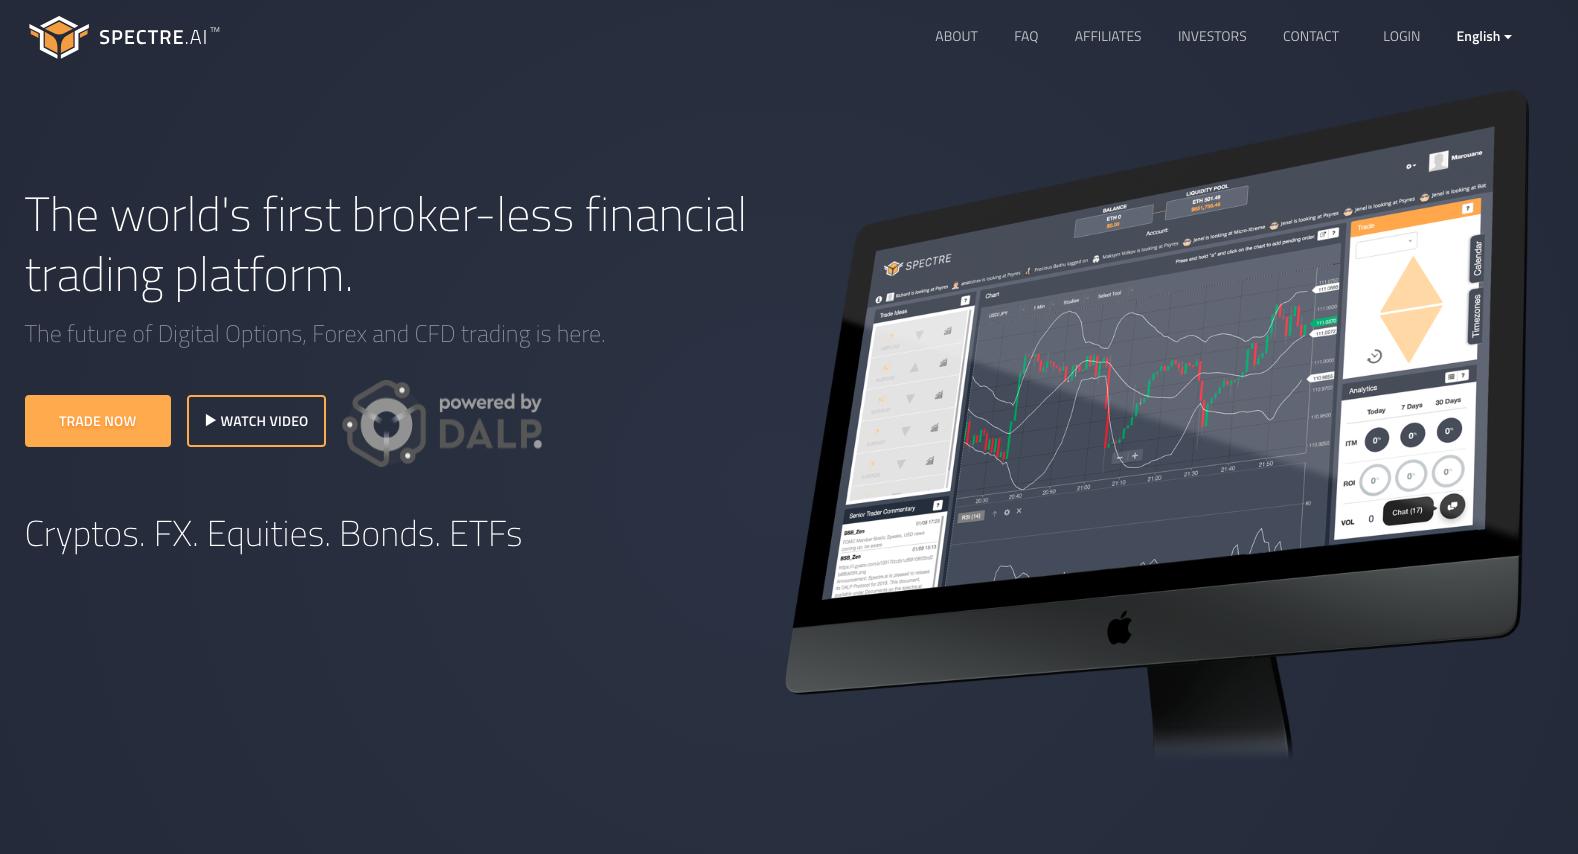 SPectre-trading-platform